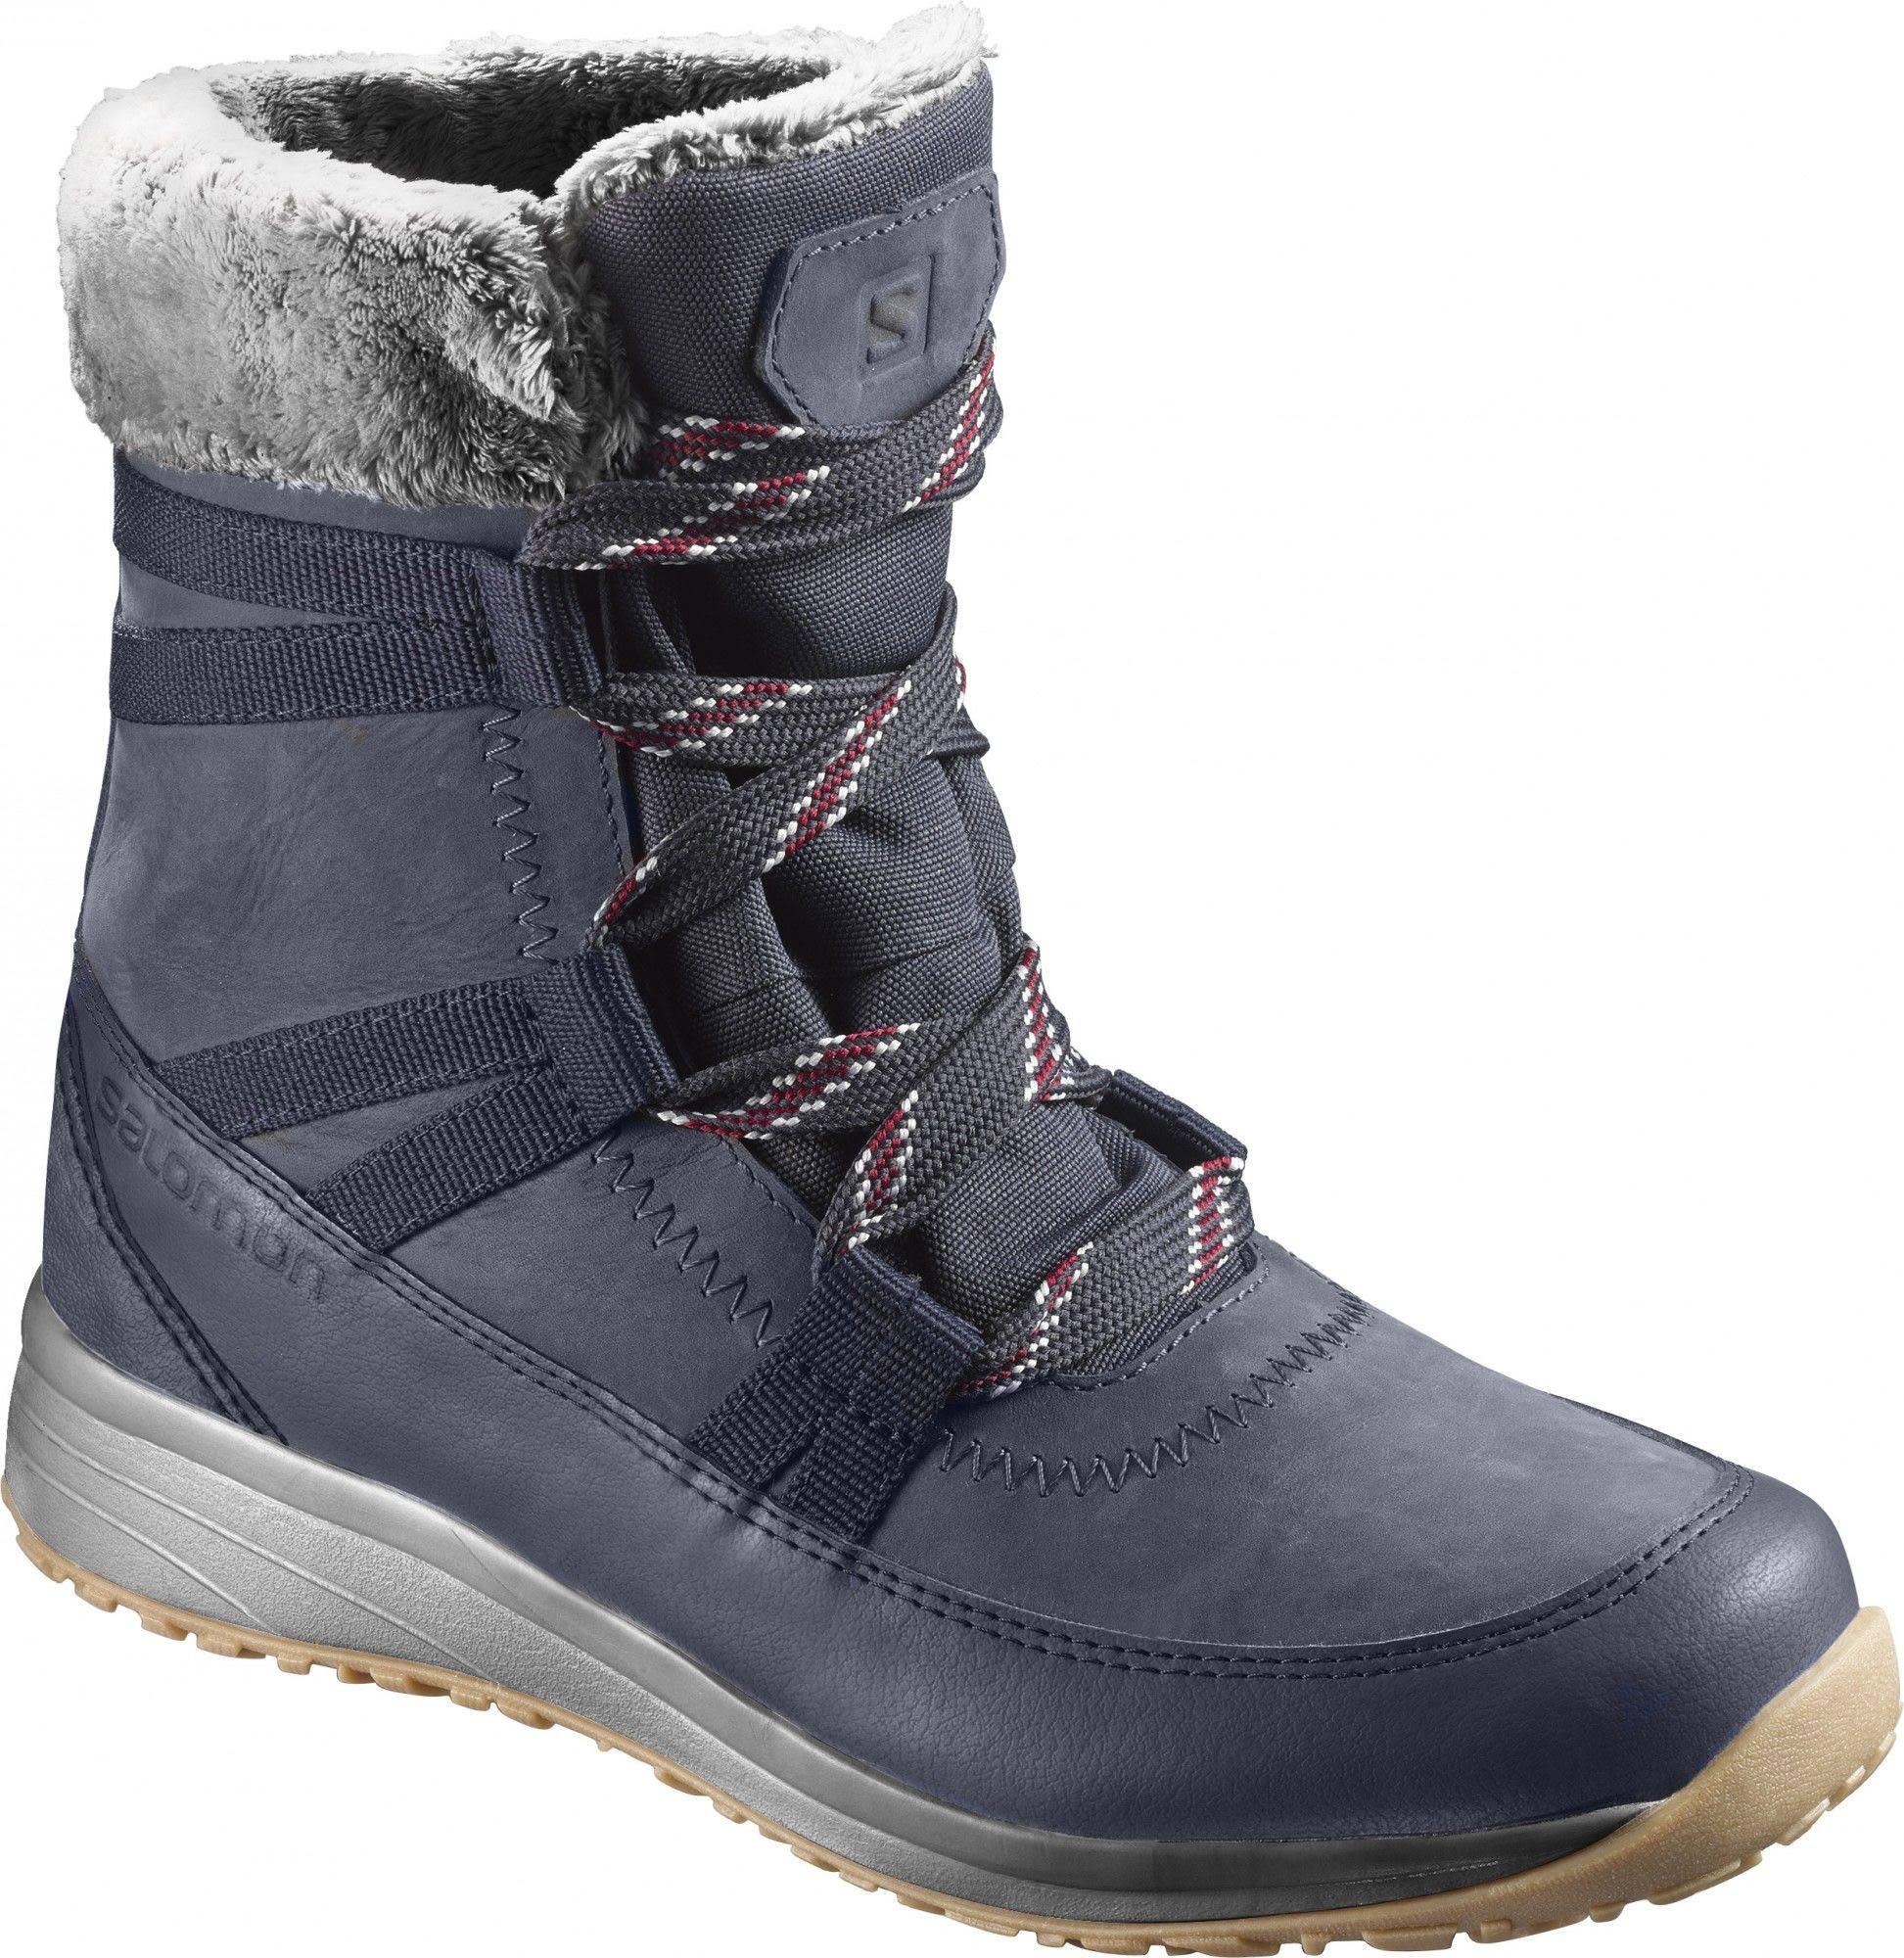 Waterproof Boots Eu 3 Color Womens size Winter Navy Beet 41 Leather Blue Red Cs Salomon Heika Red 1 Blazer CwzBxqRR